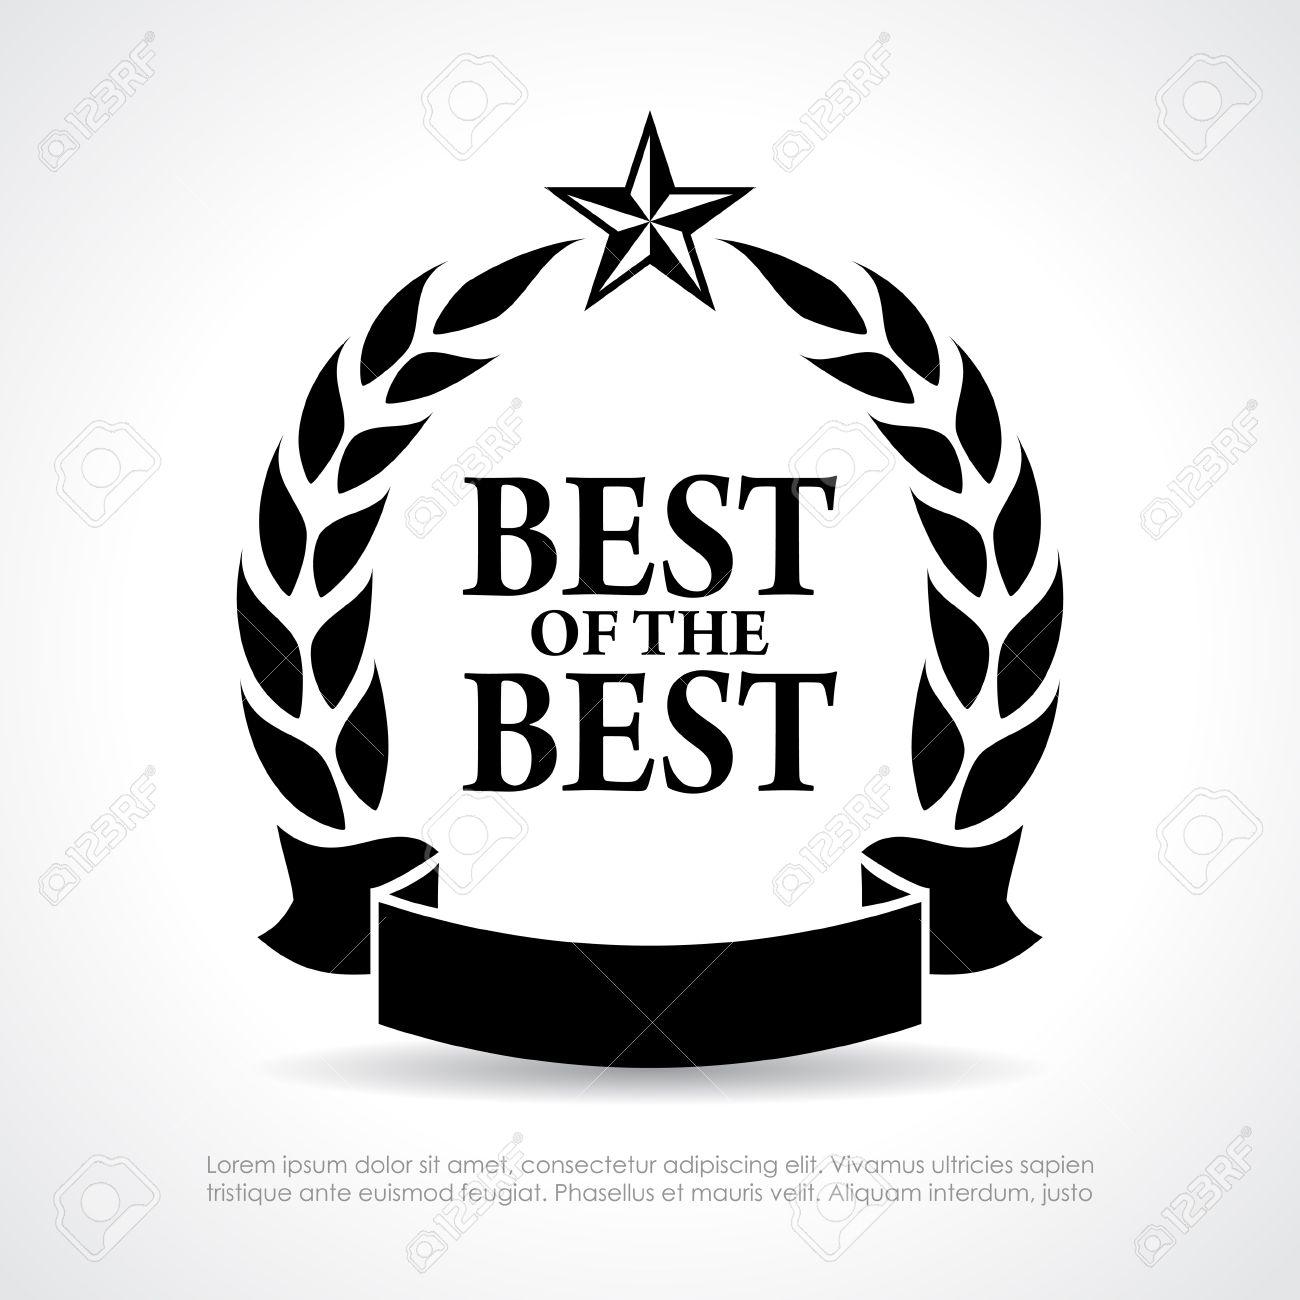 Discos así al tun tun 34144225-best-of-the-best-icon